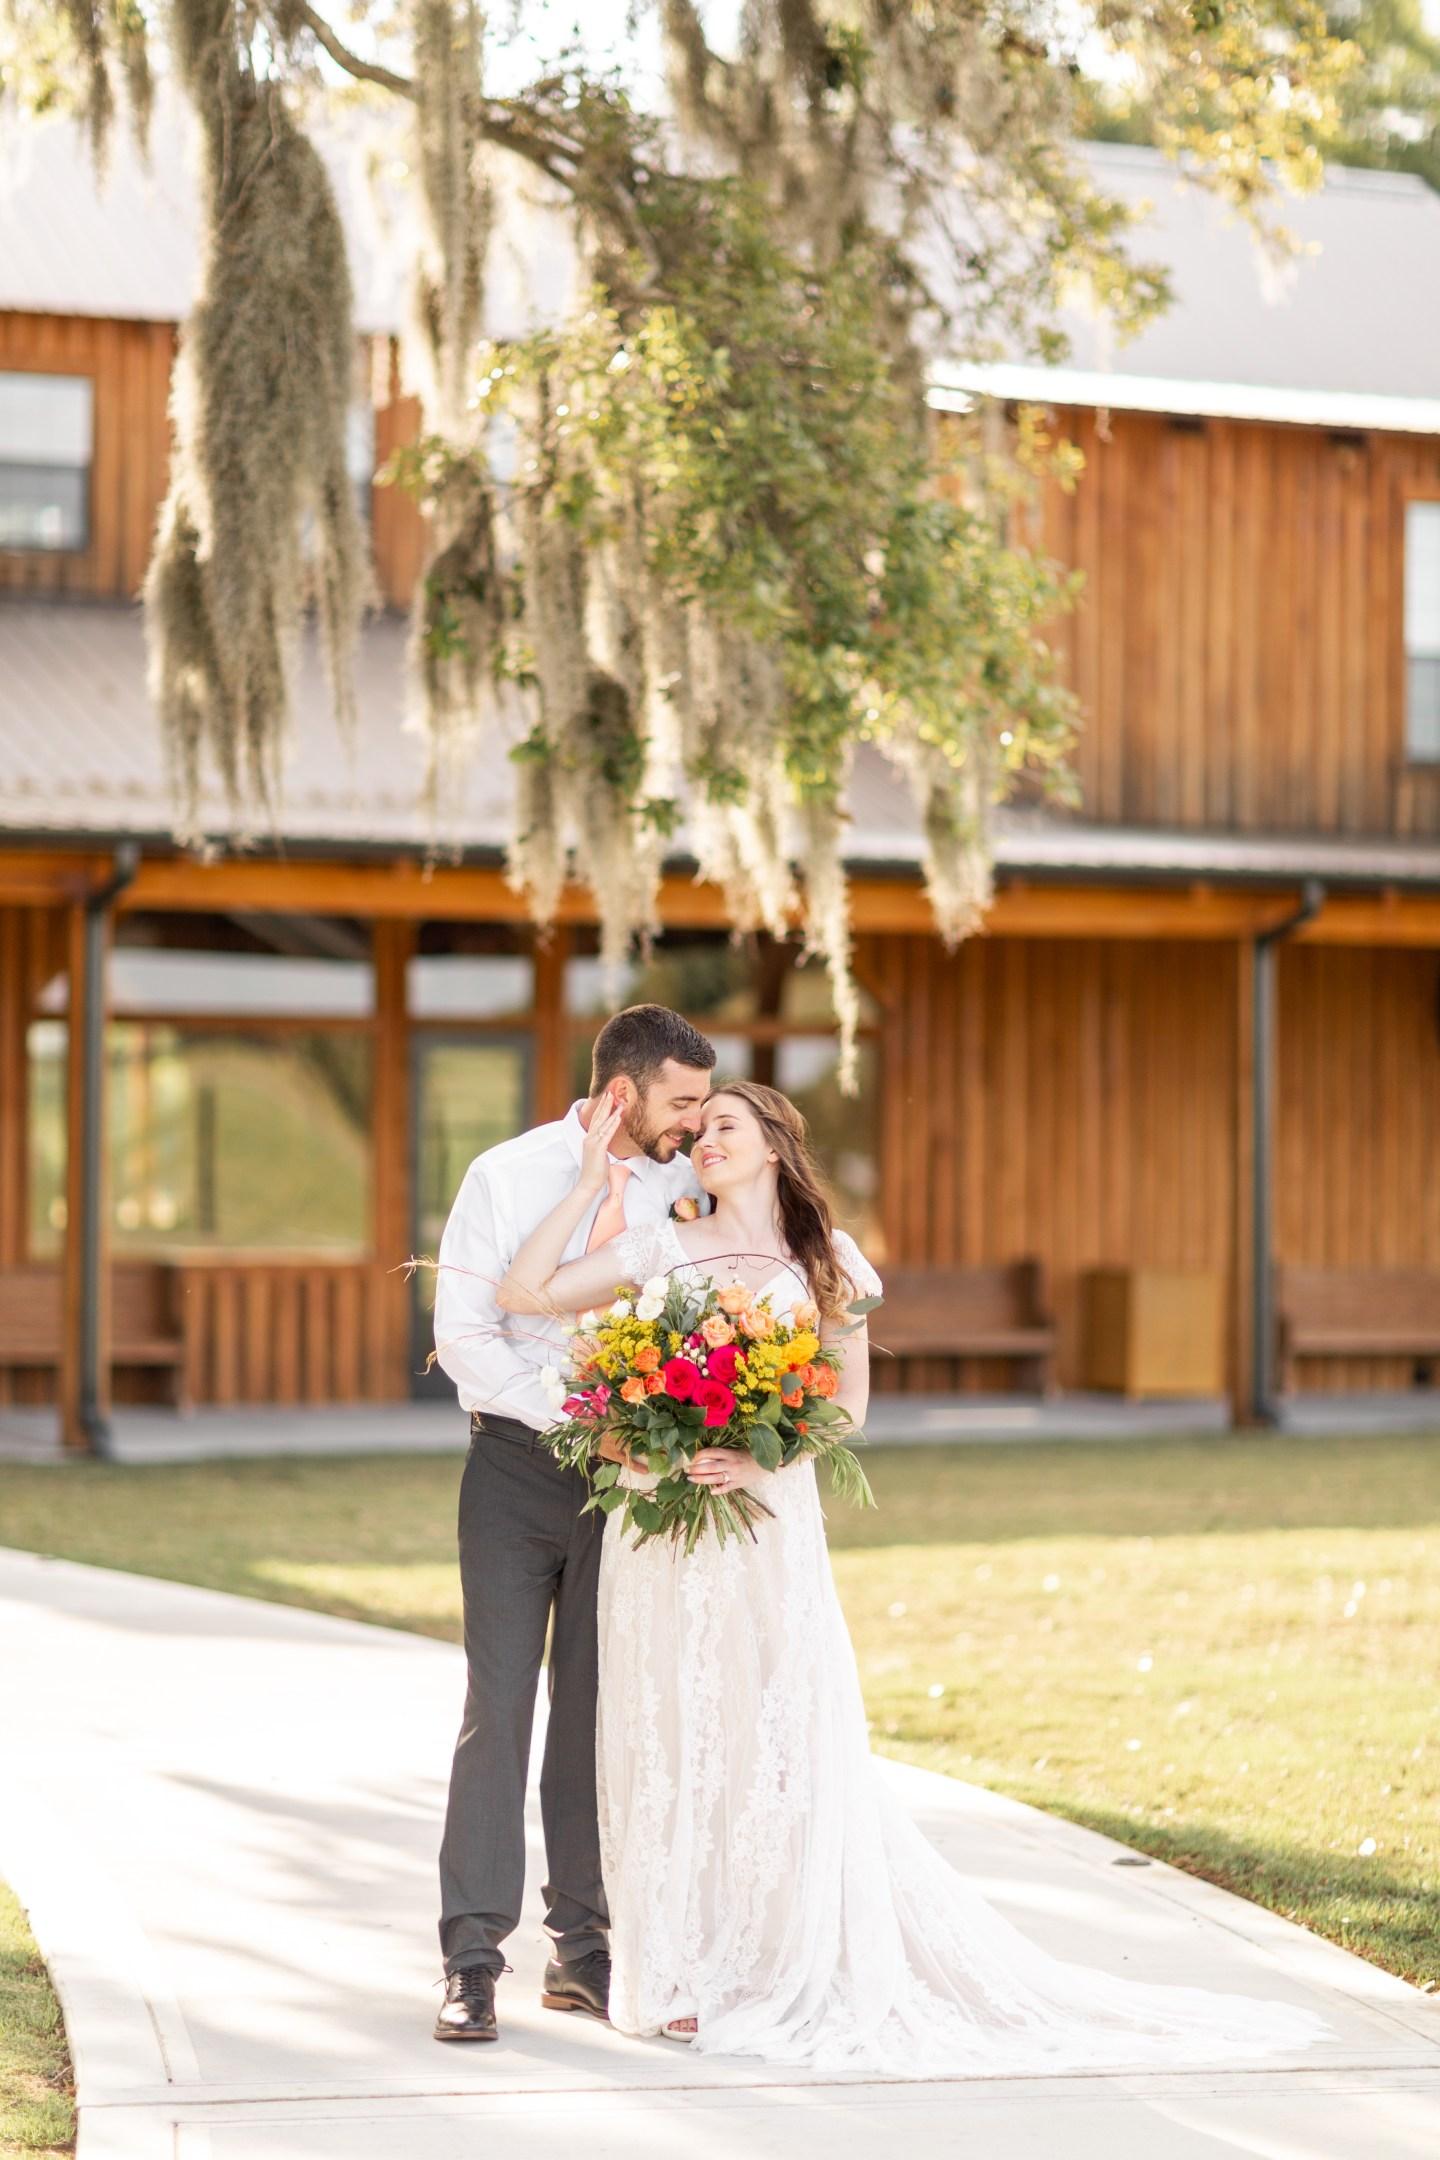 Wedding Photographer Resources